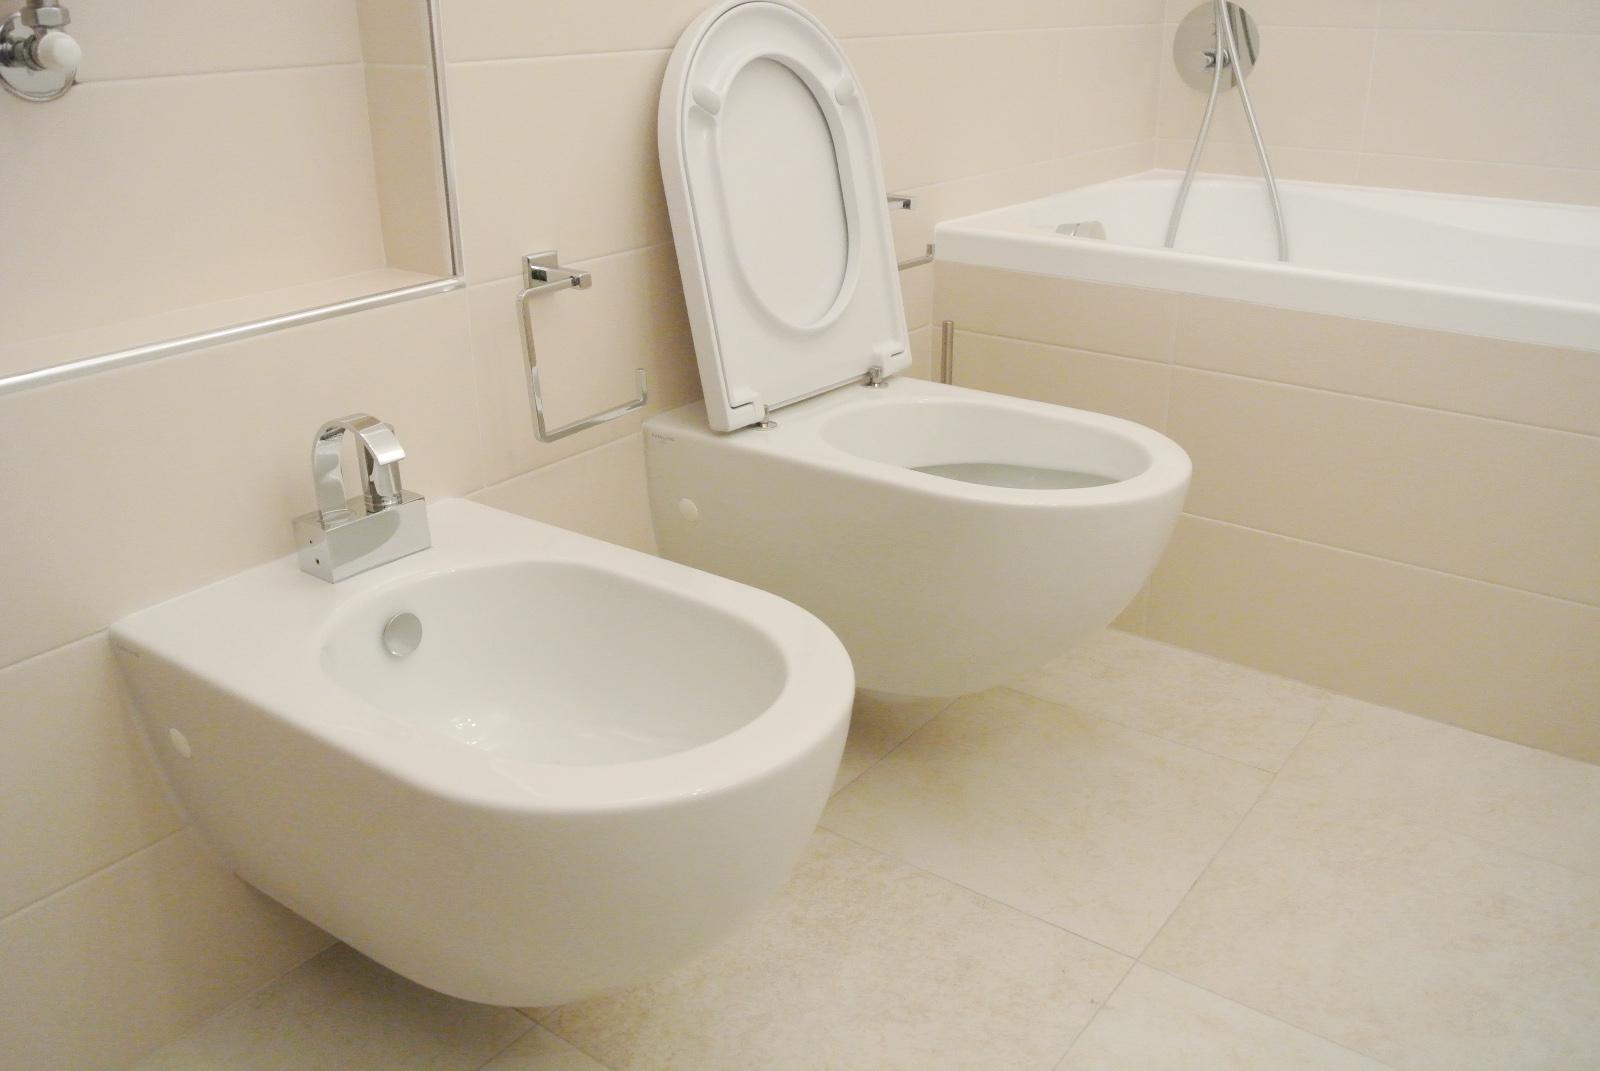 sintesibagno-arredobagno-arredo-bagno-svizzera-mobile-puntotre-lavabo-appoggio-catalano-sanitari-sospesi-catalano-sfera